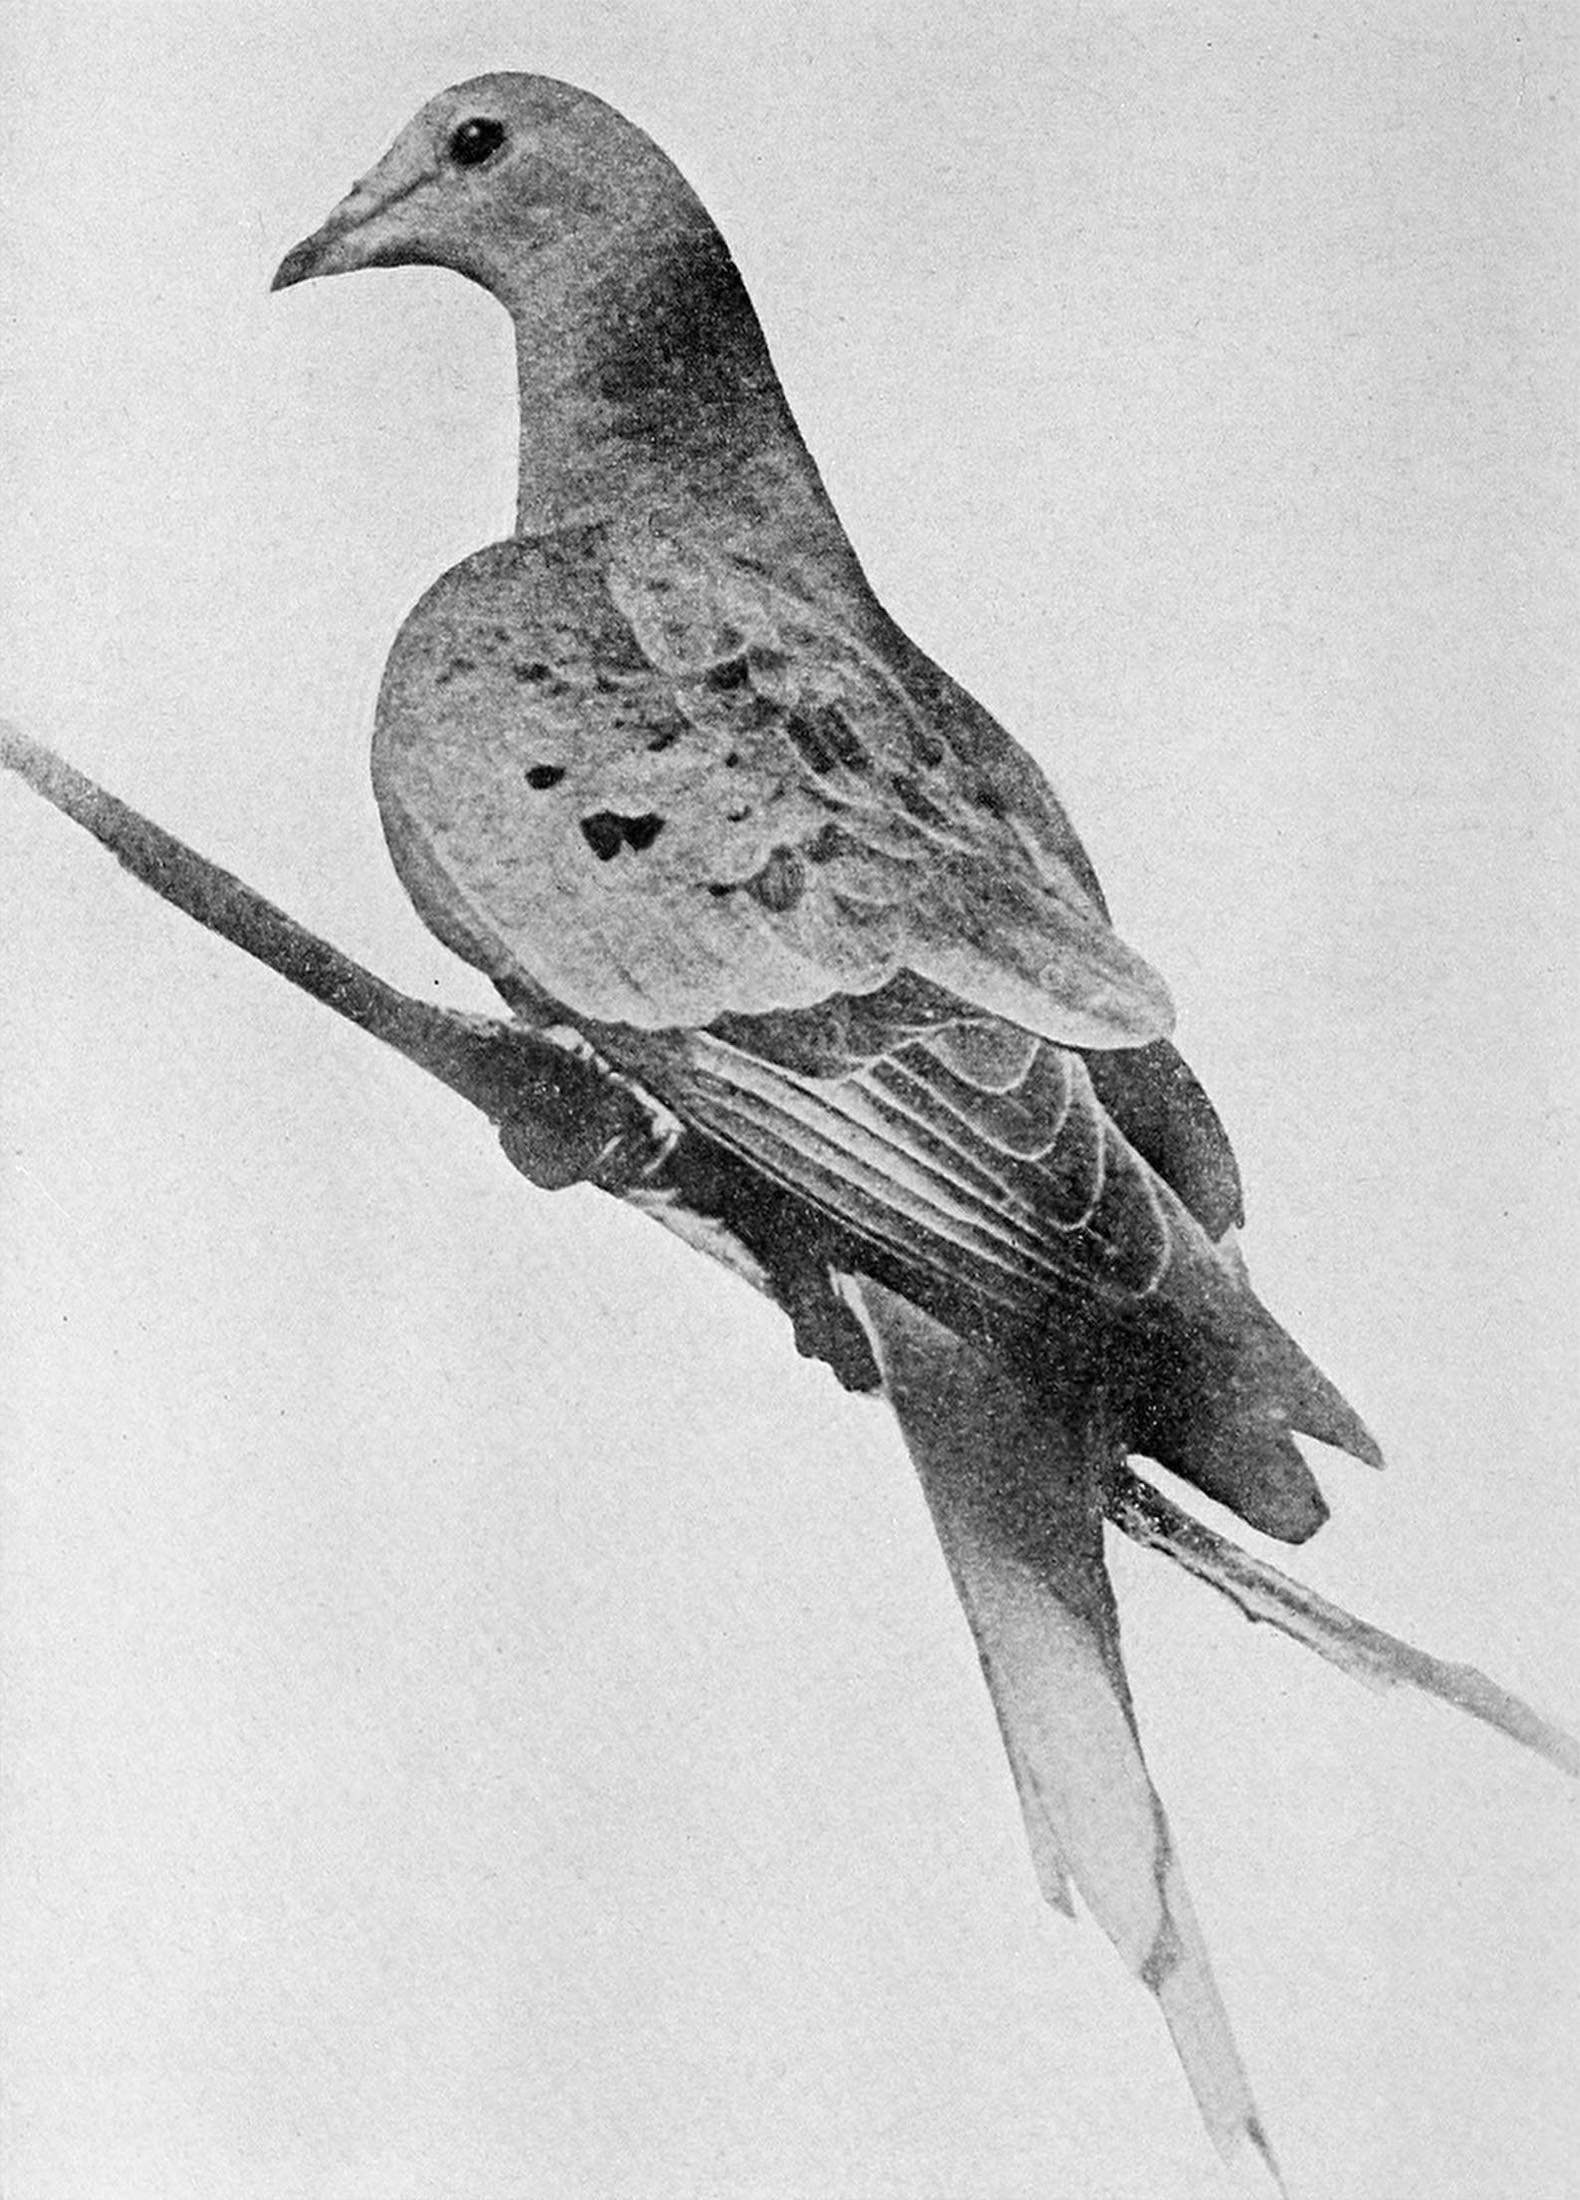 An illustration of a passenger pigeon